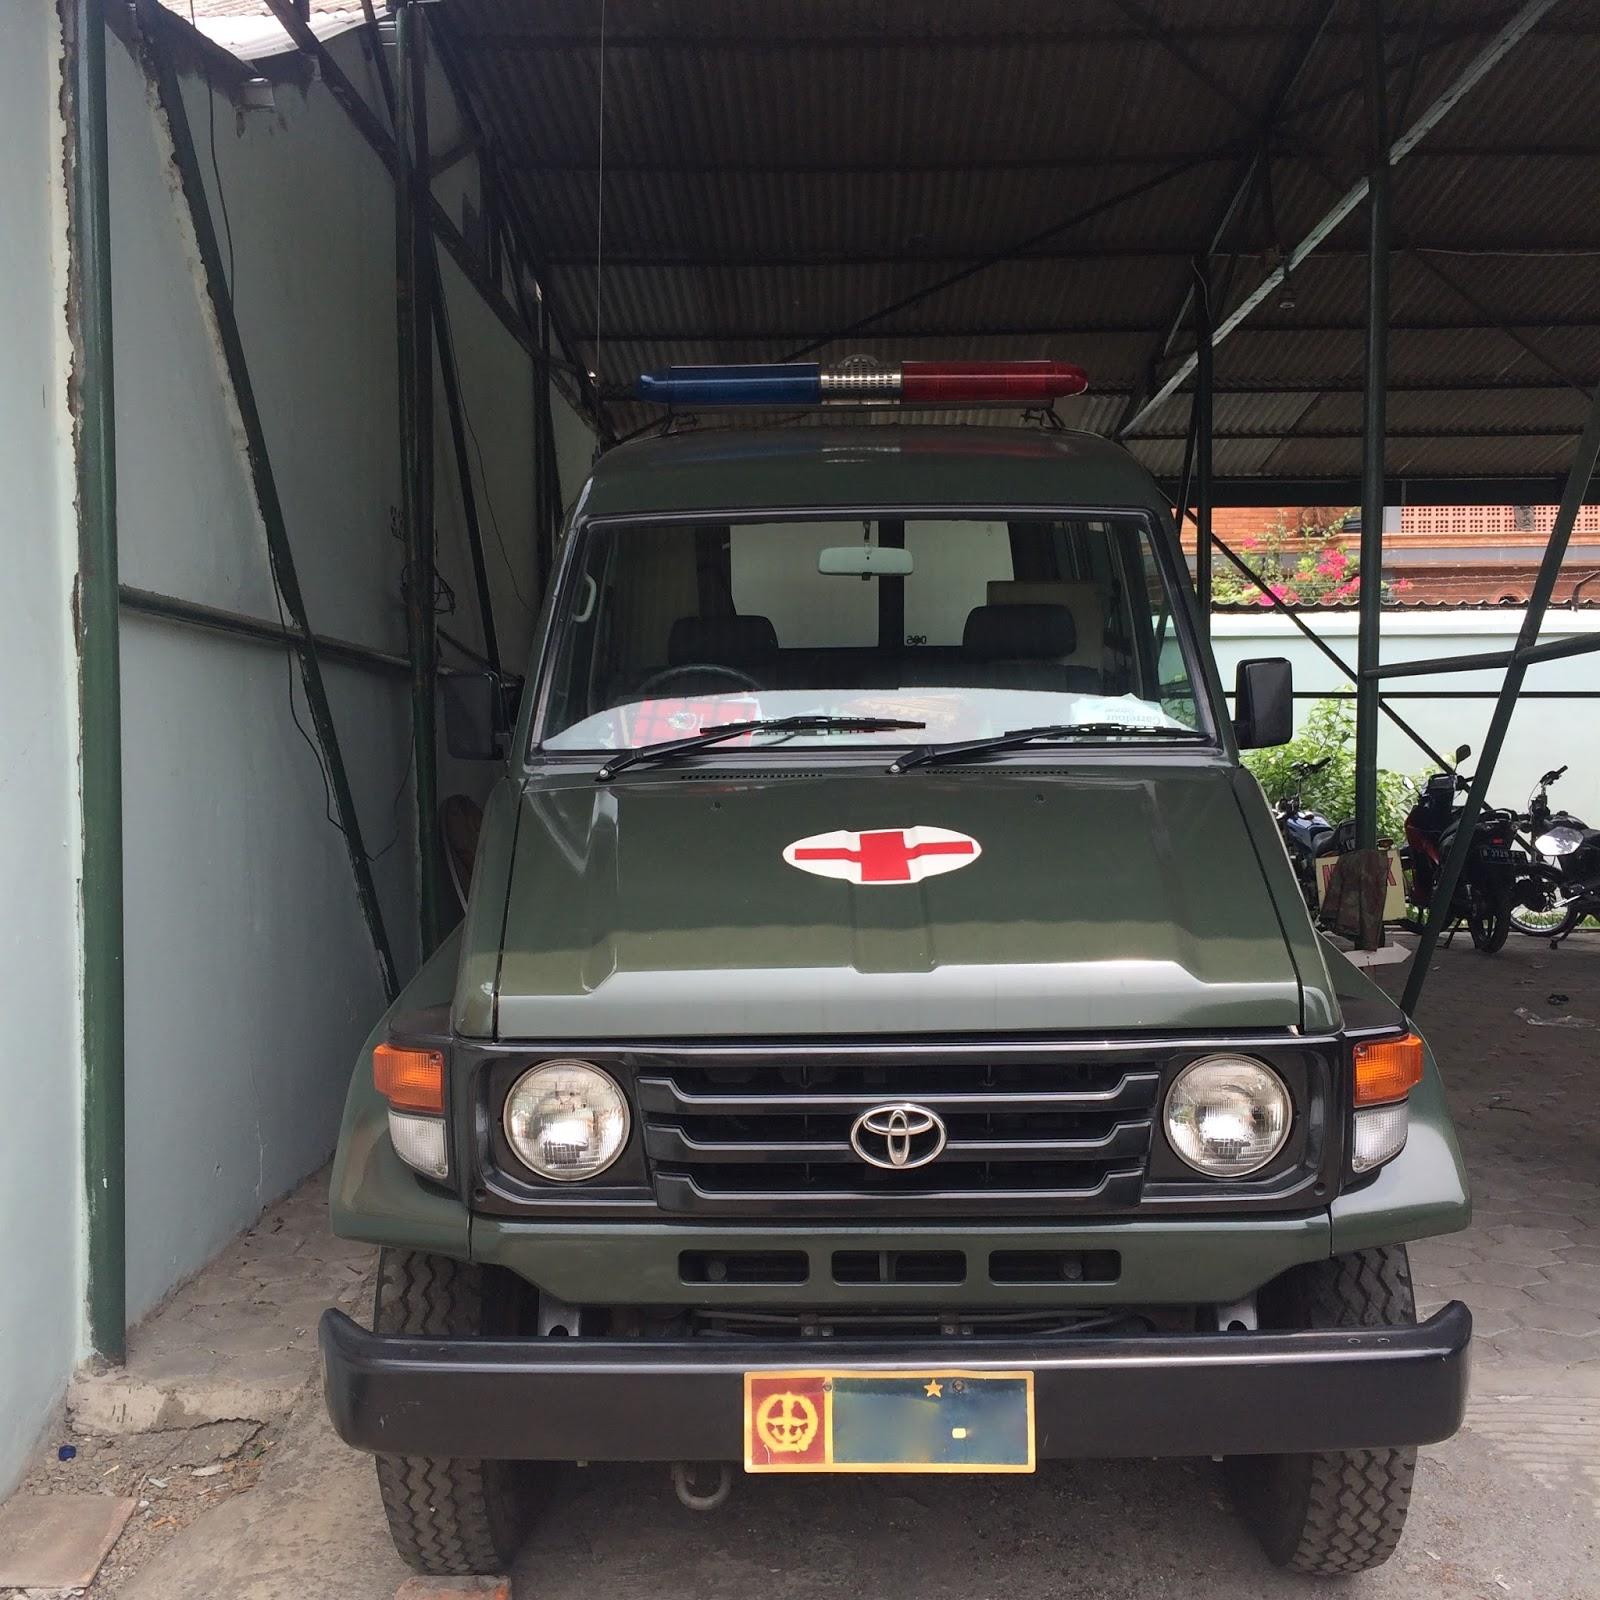 Toyota Land Cruiser J70 Jakarta Rare Car Spotting 70 2015